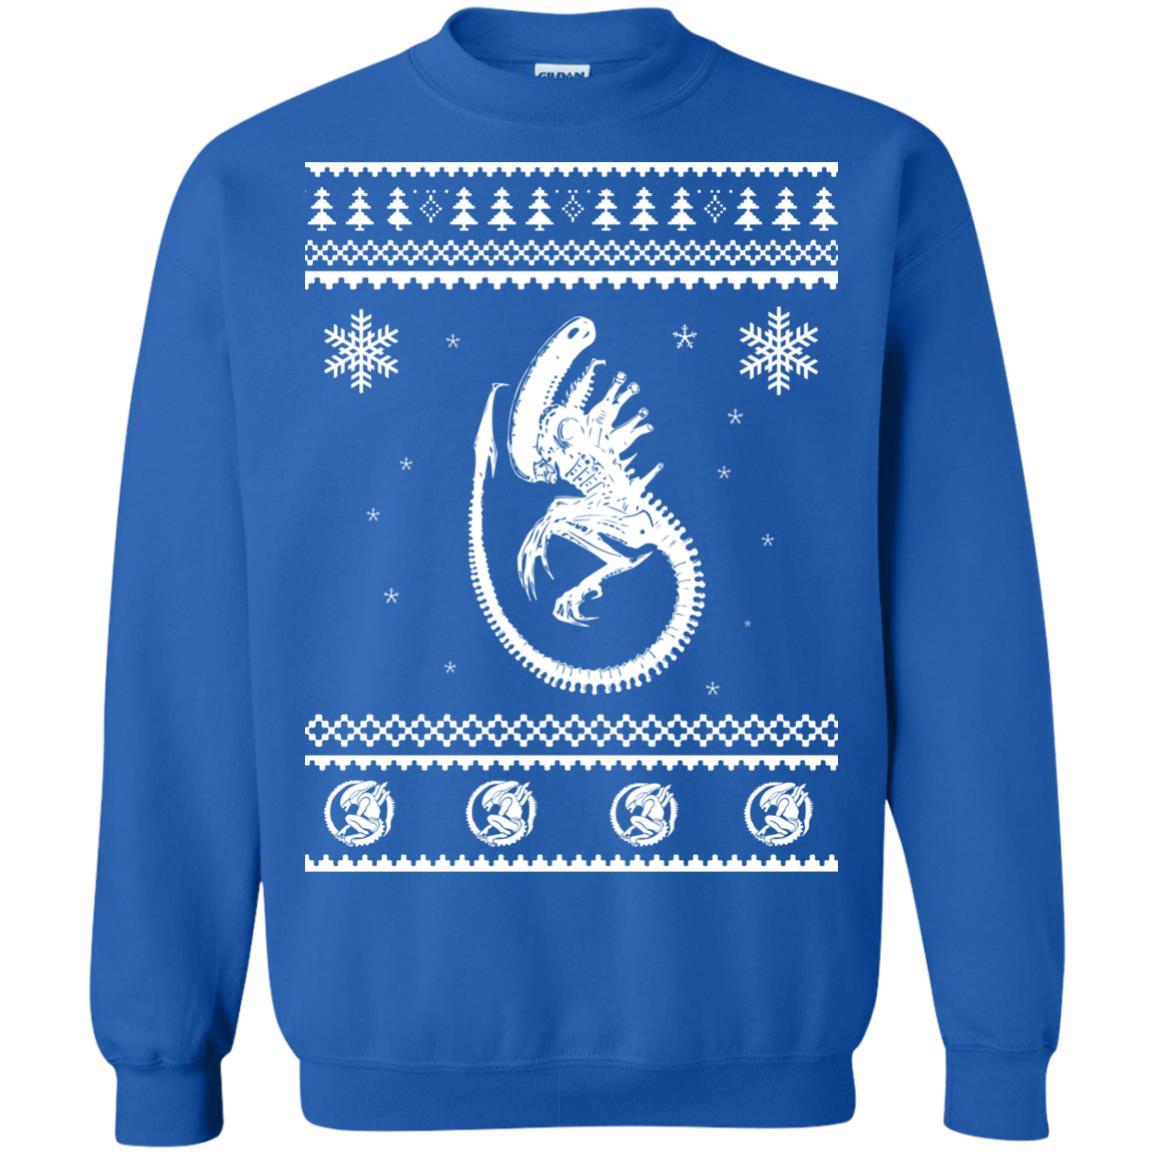 image 2851 - Xeno-mas - Aliens Xenomorph Christmas Sweater, Shirt, Hoodie